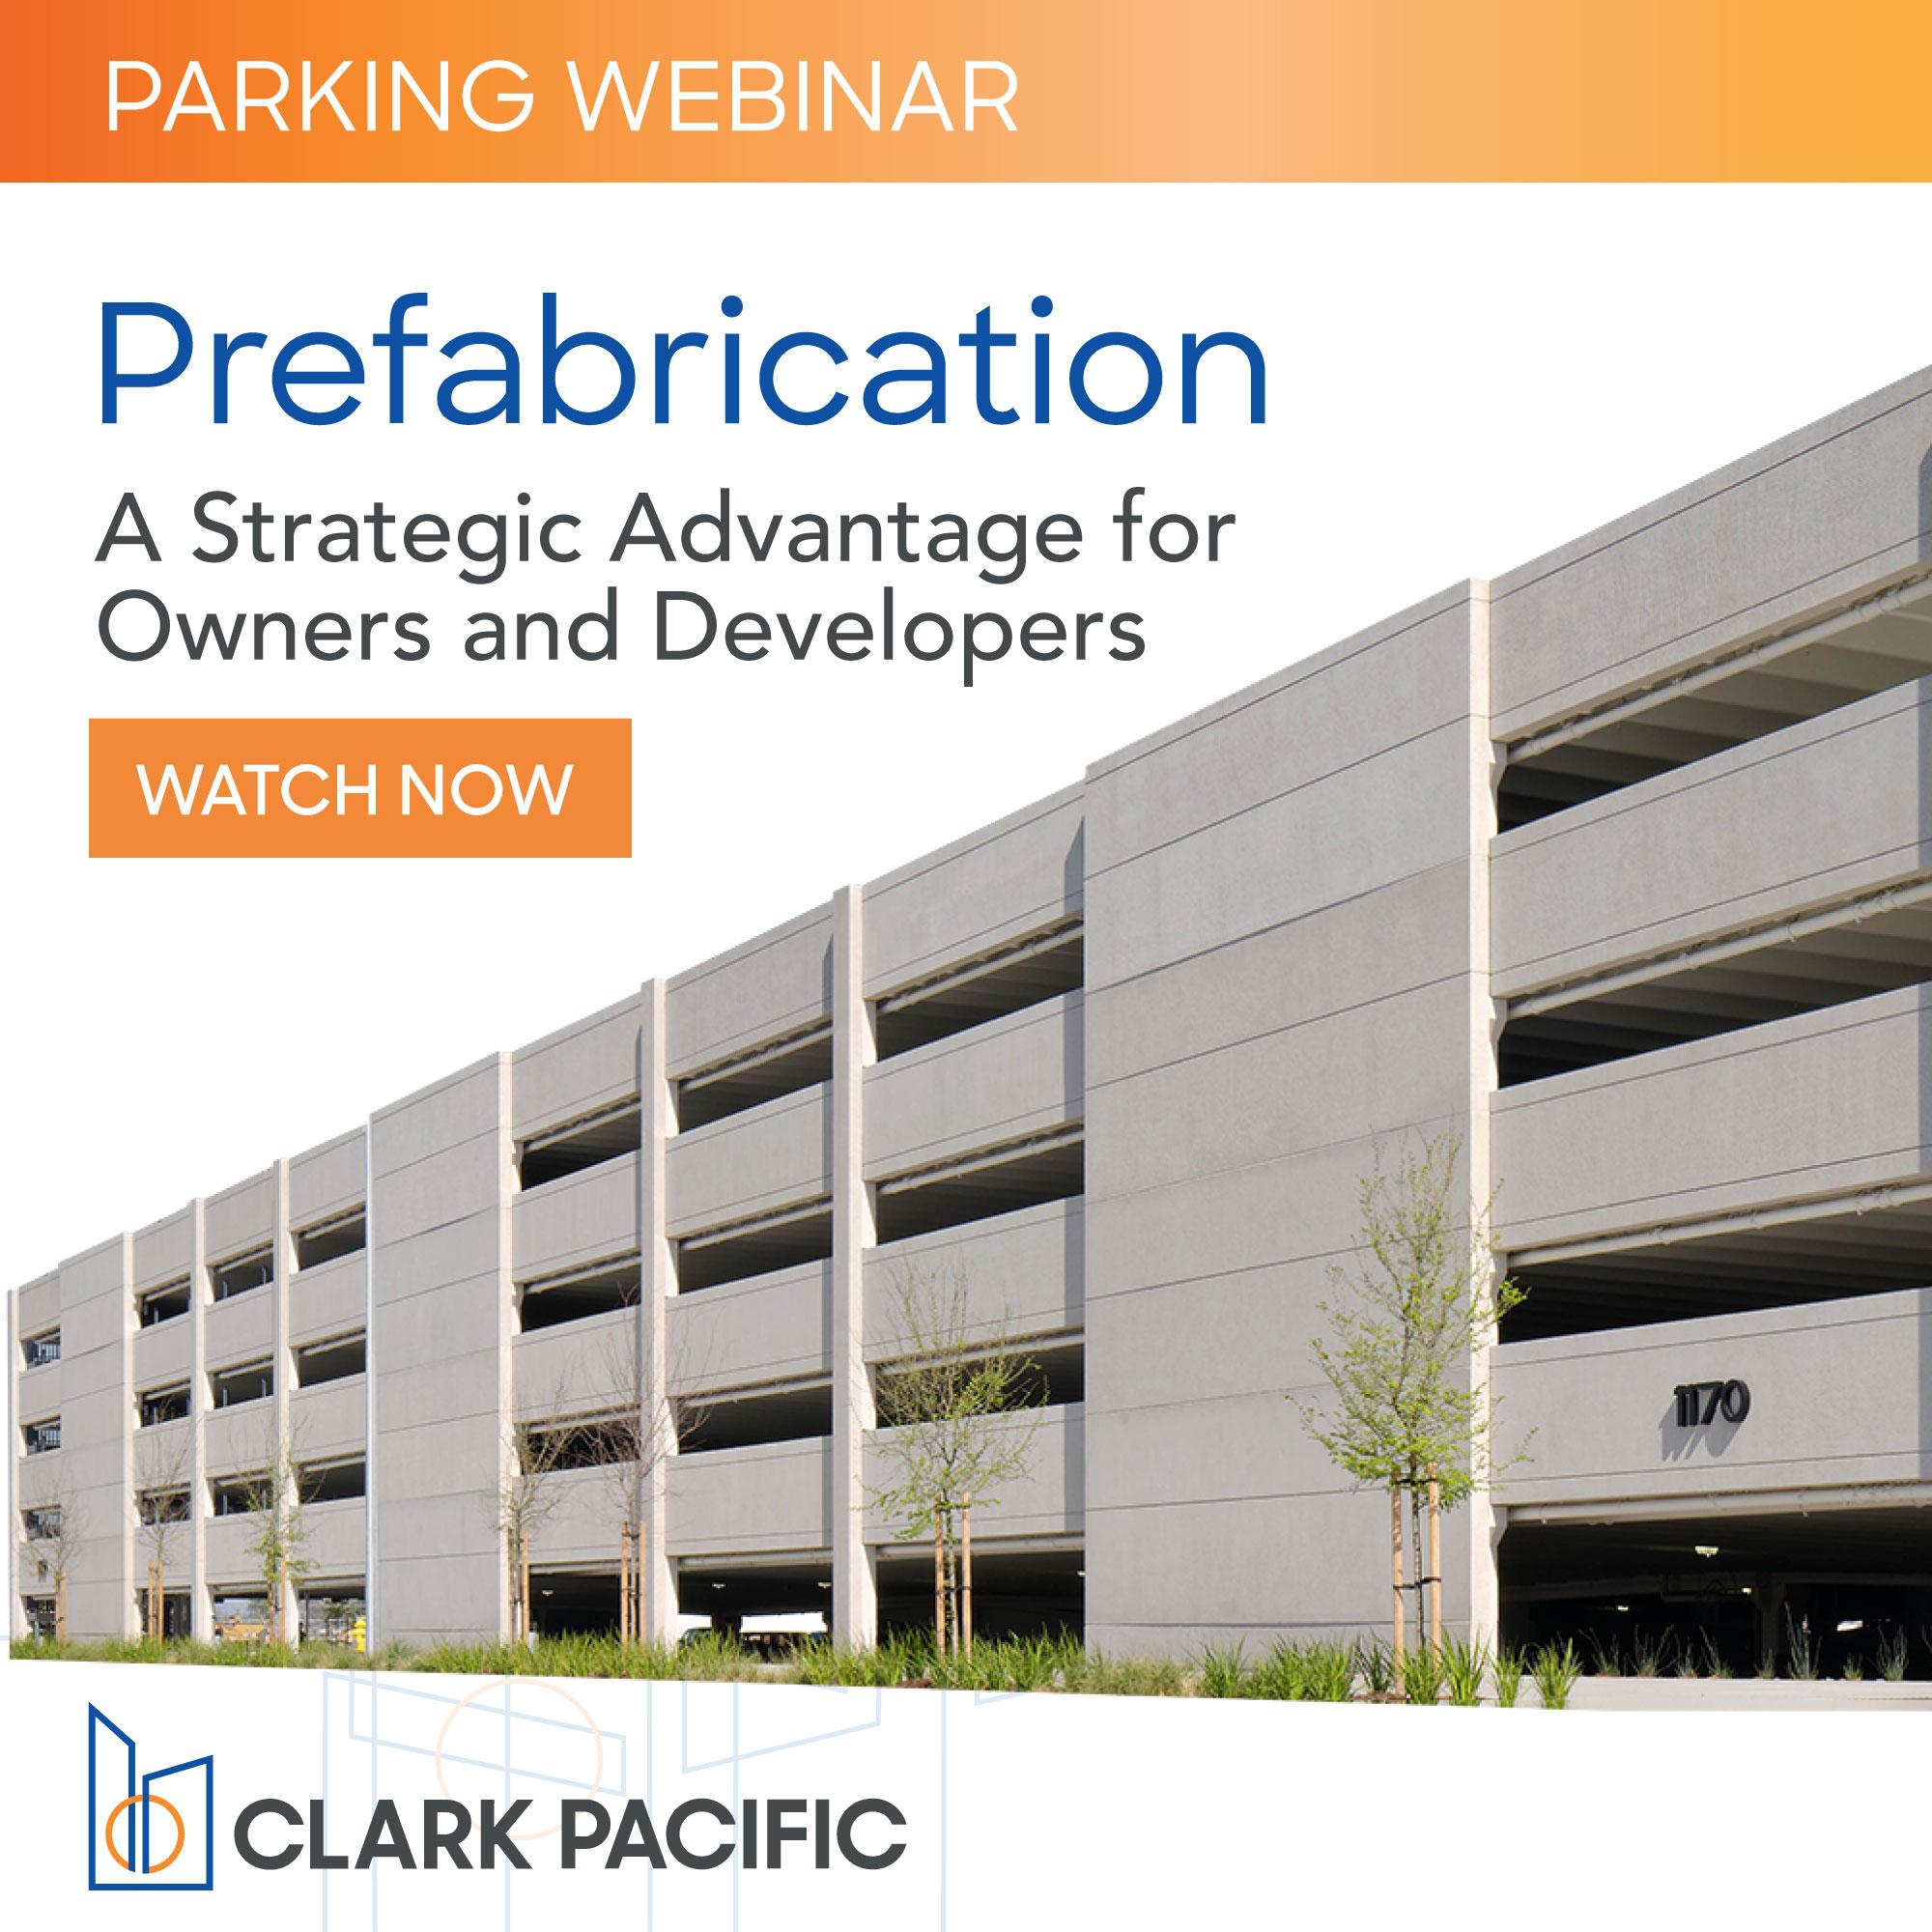 Watch our Prefabrication for parking webinar